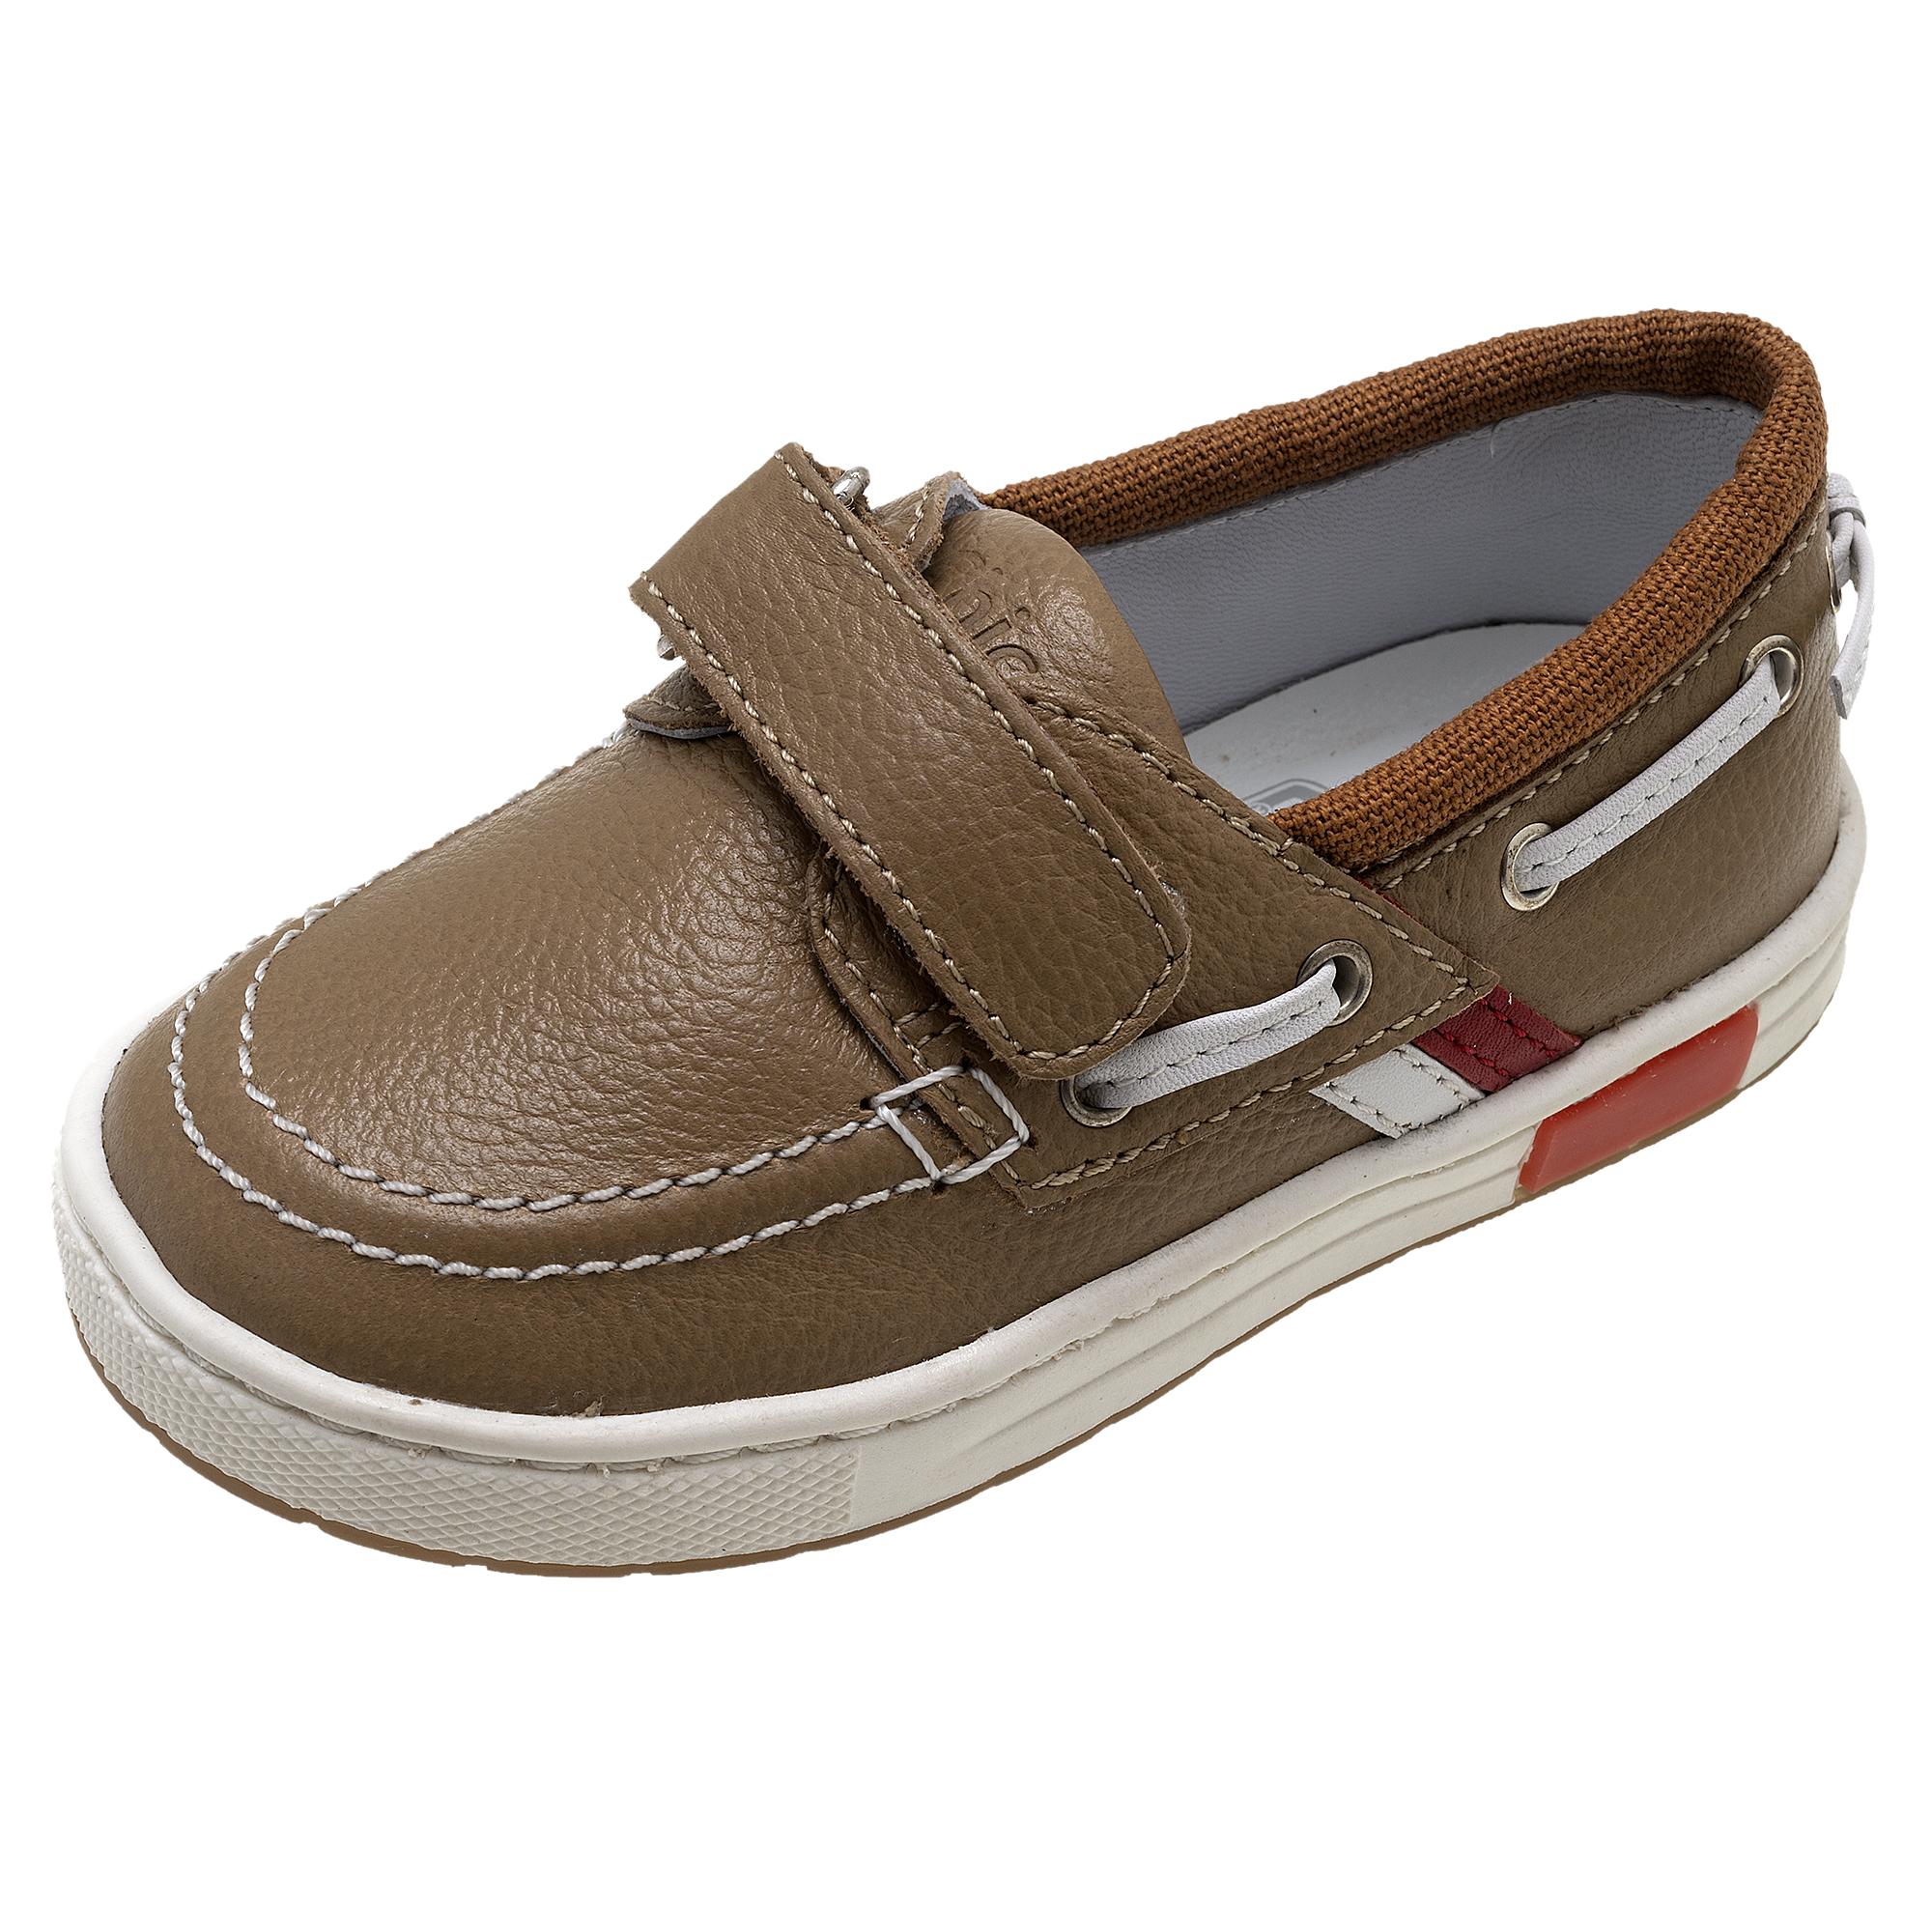 Pantofi copii Chicco Casax, maro, 61597 din categoria Pantofi copii